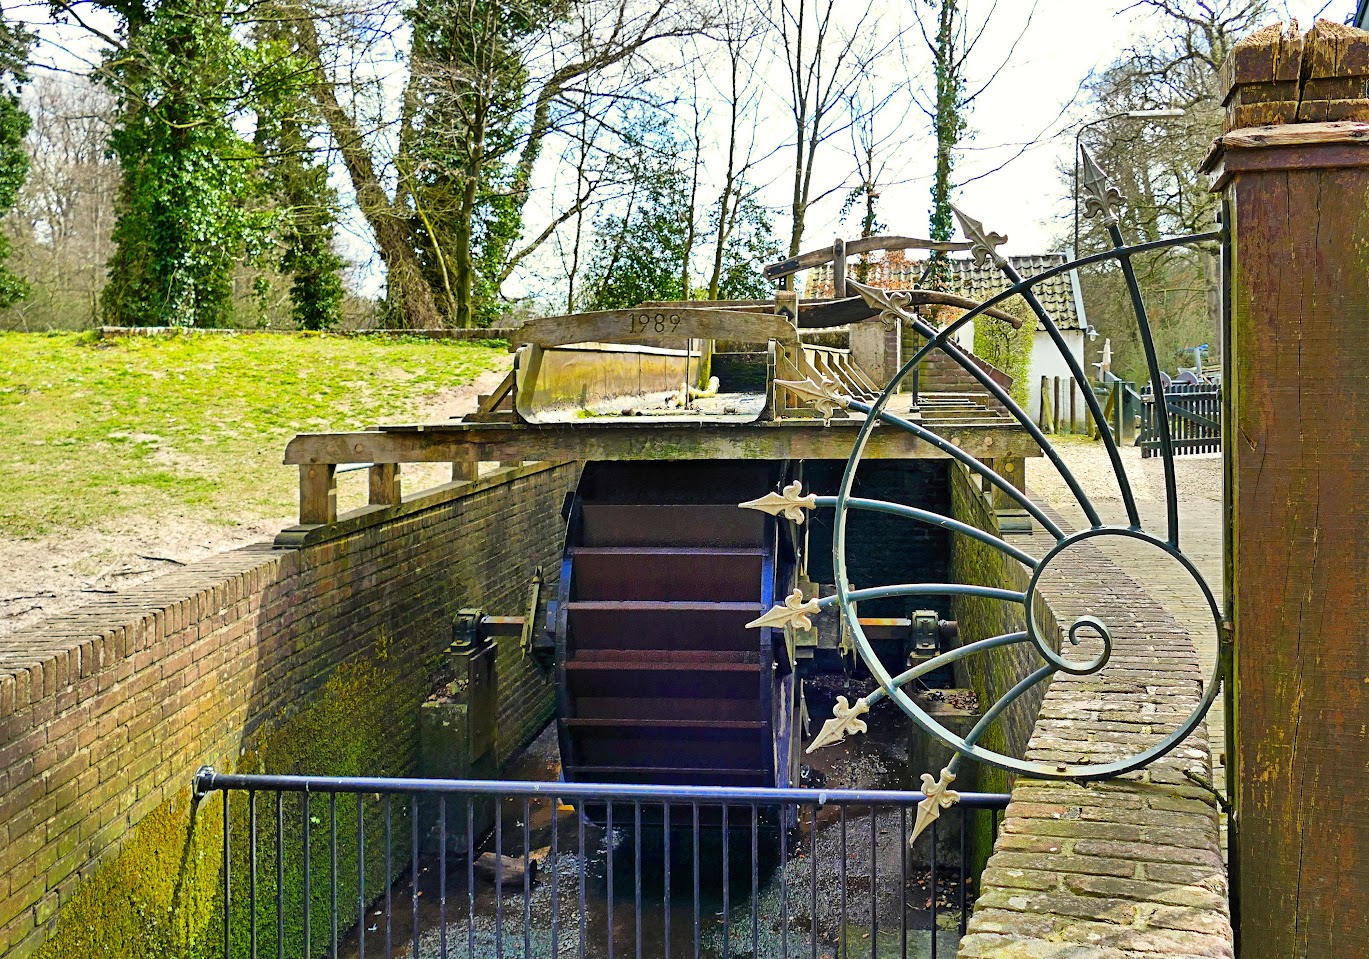 Aangeboden door: Stichting Microtoerisme InZicht Fotoblog Staverden water molen rad